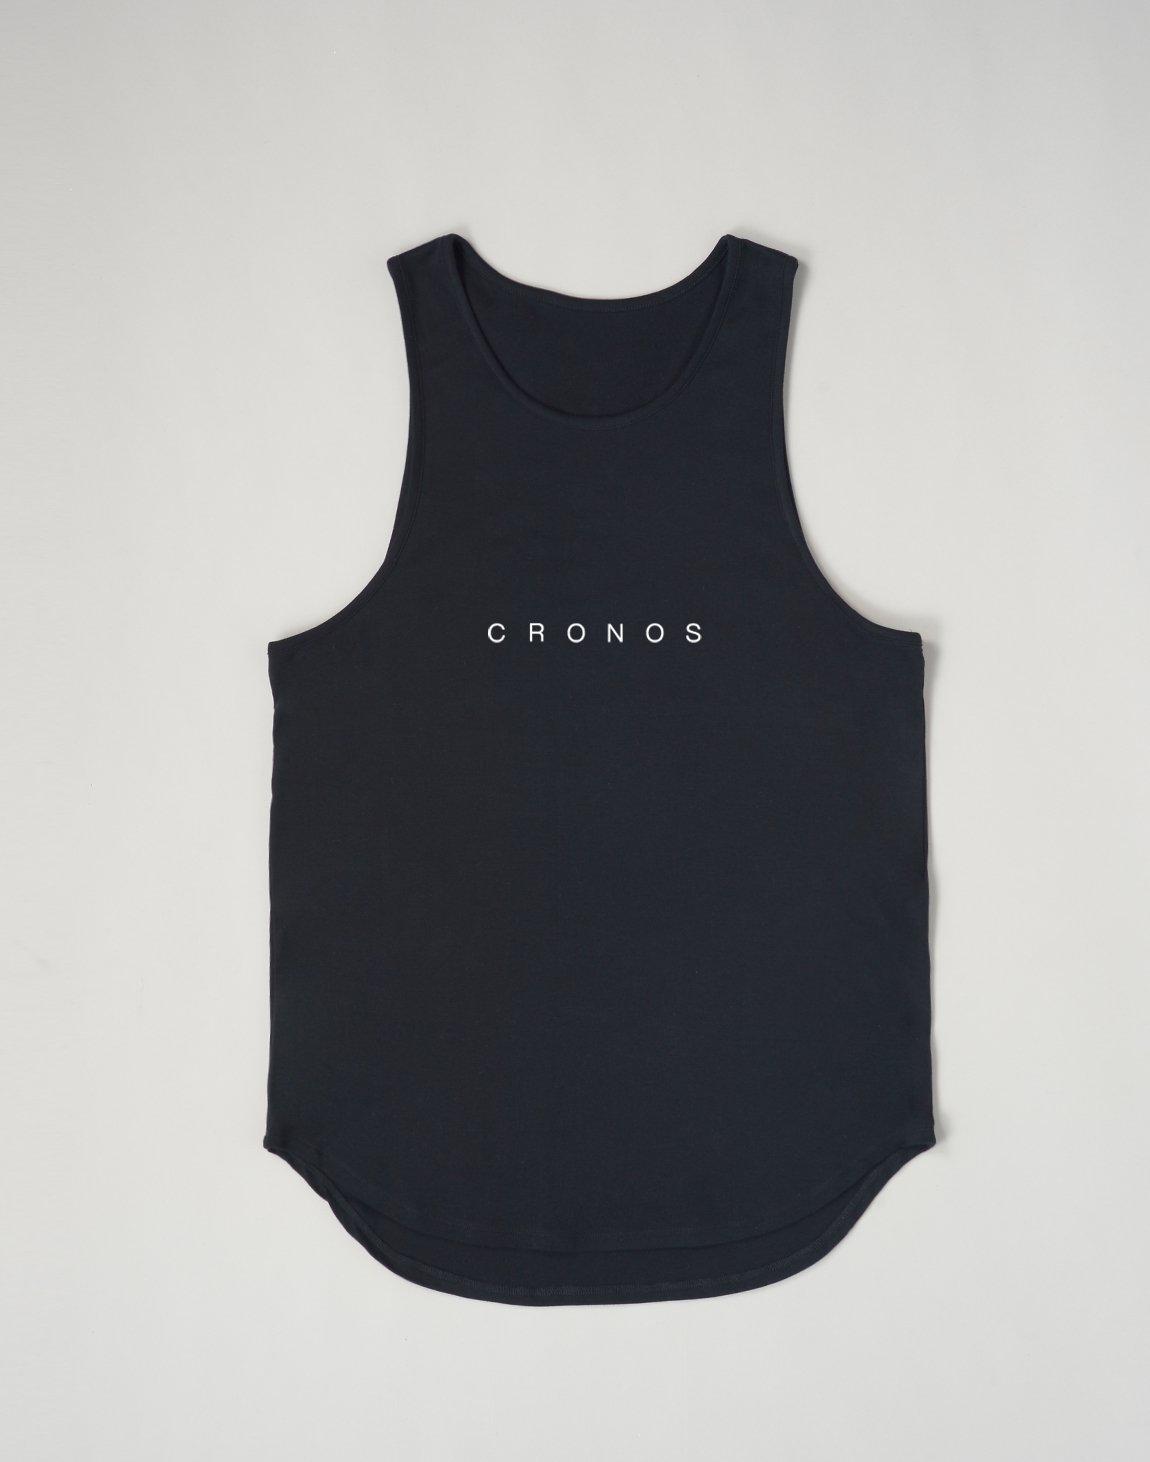 CRONOS NEW FONT LOGO TANK TOP【BLACK】